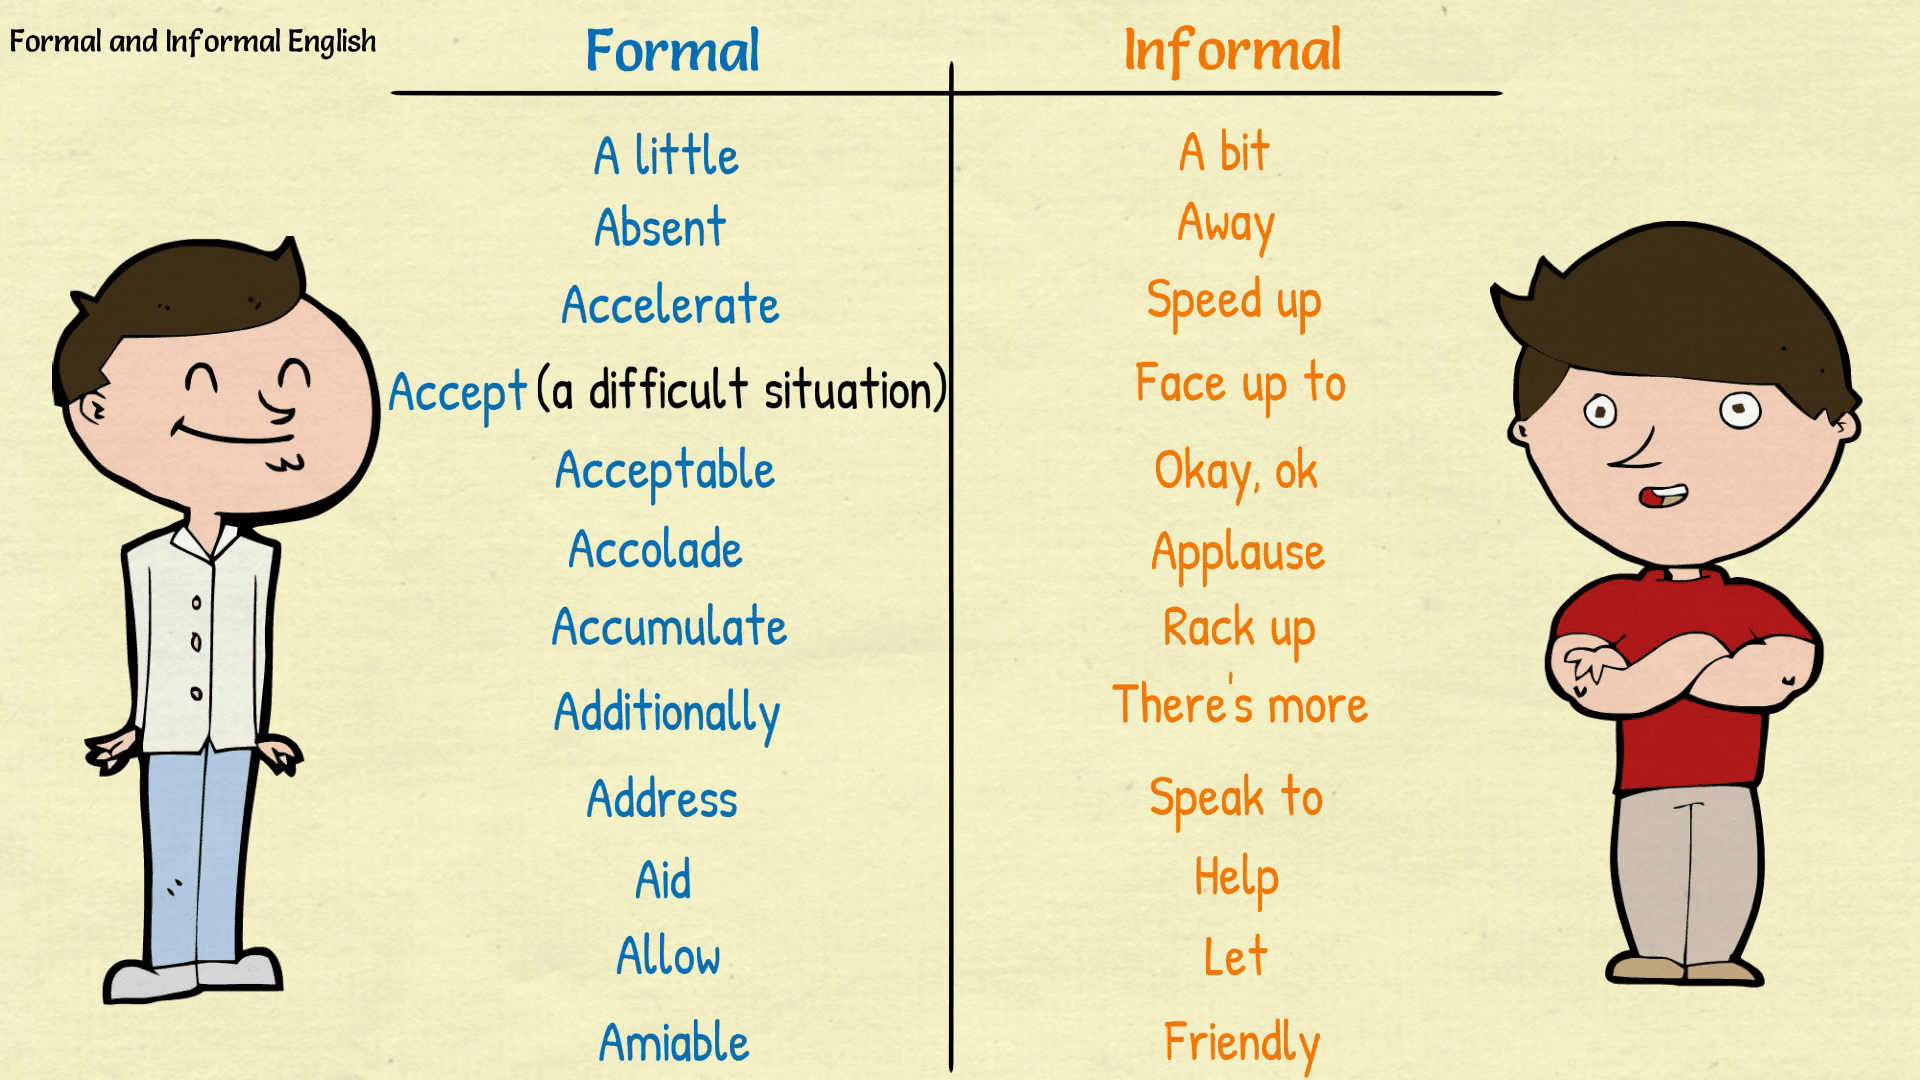 Formal and Informal English Words | English | Pinterest